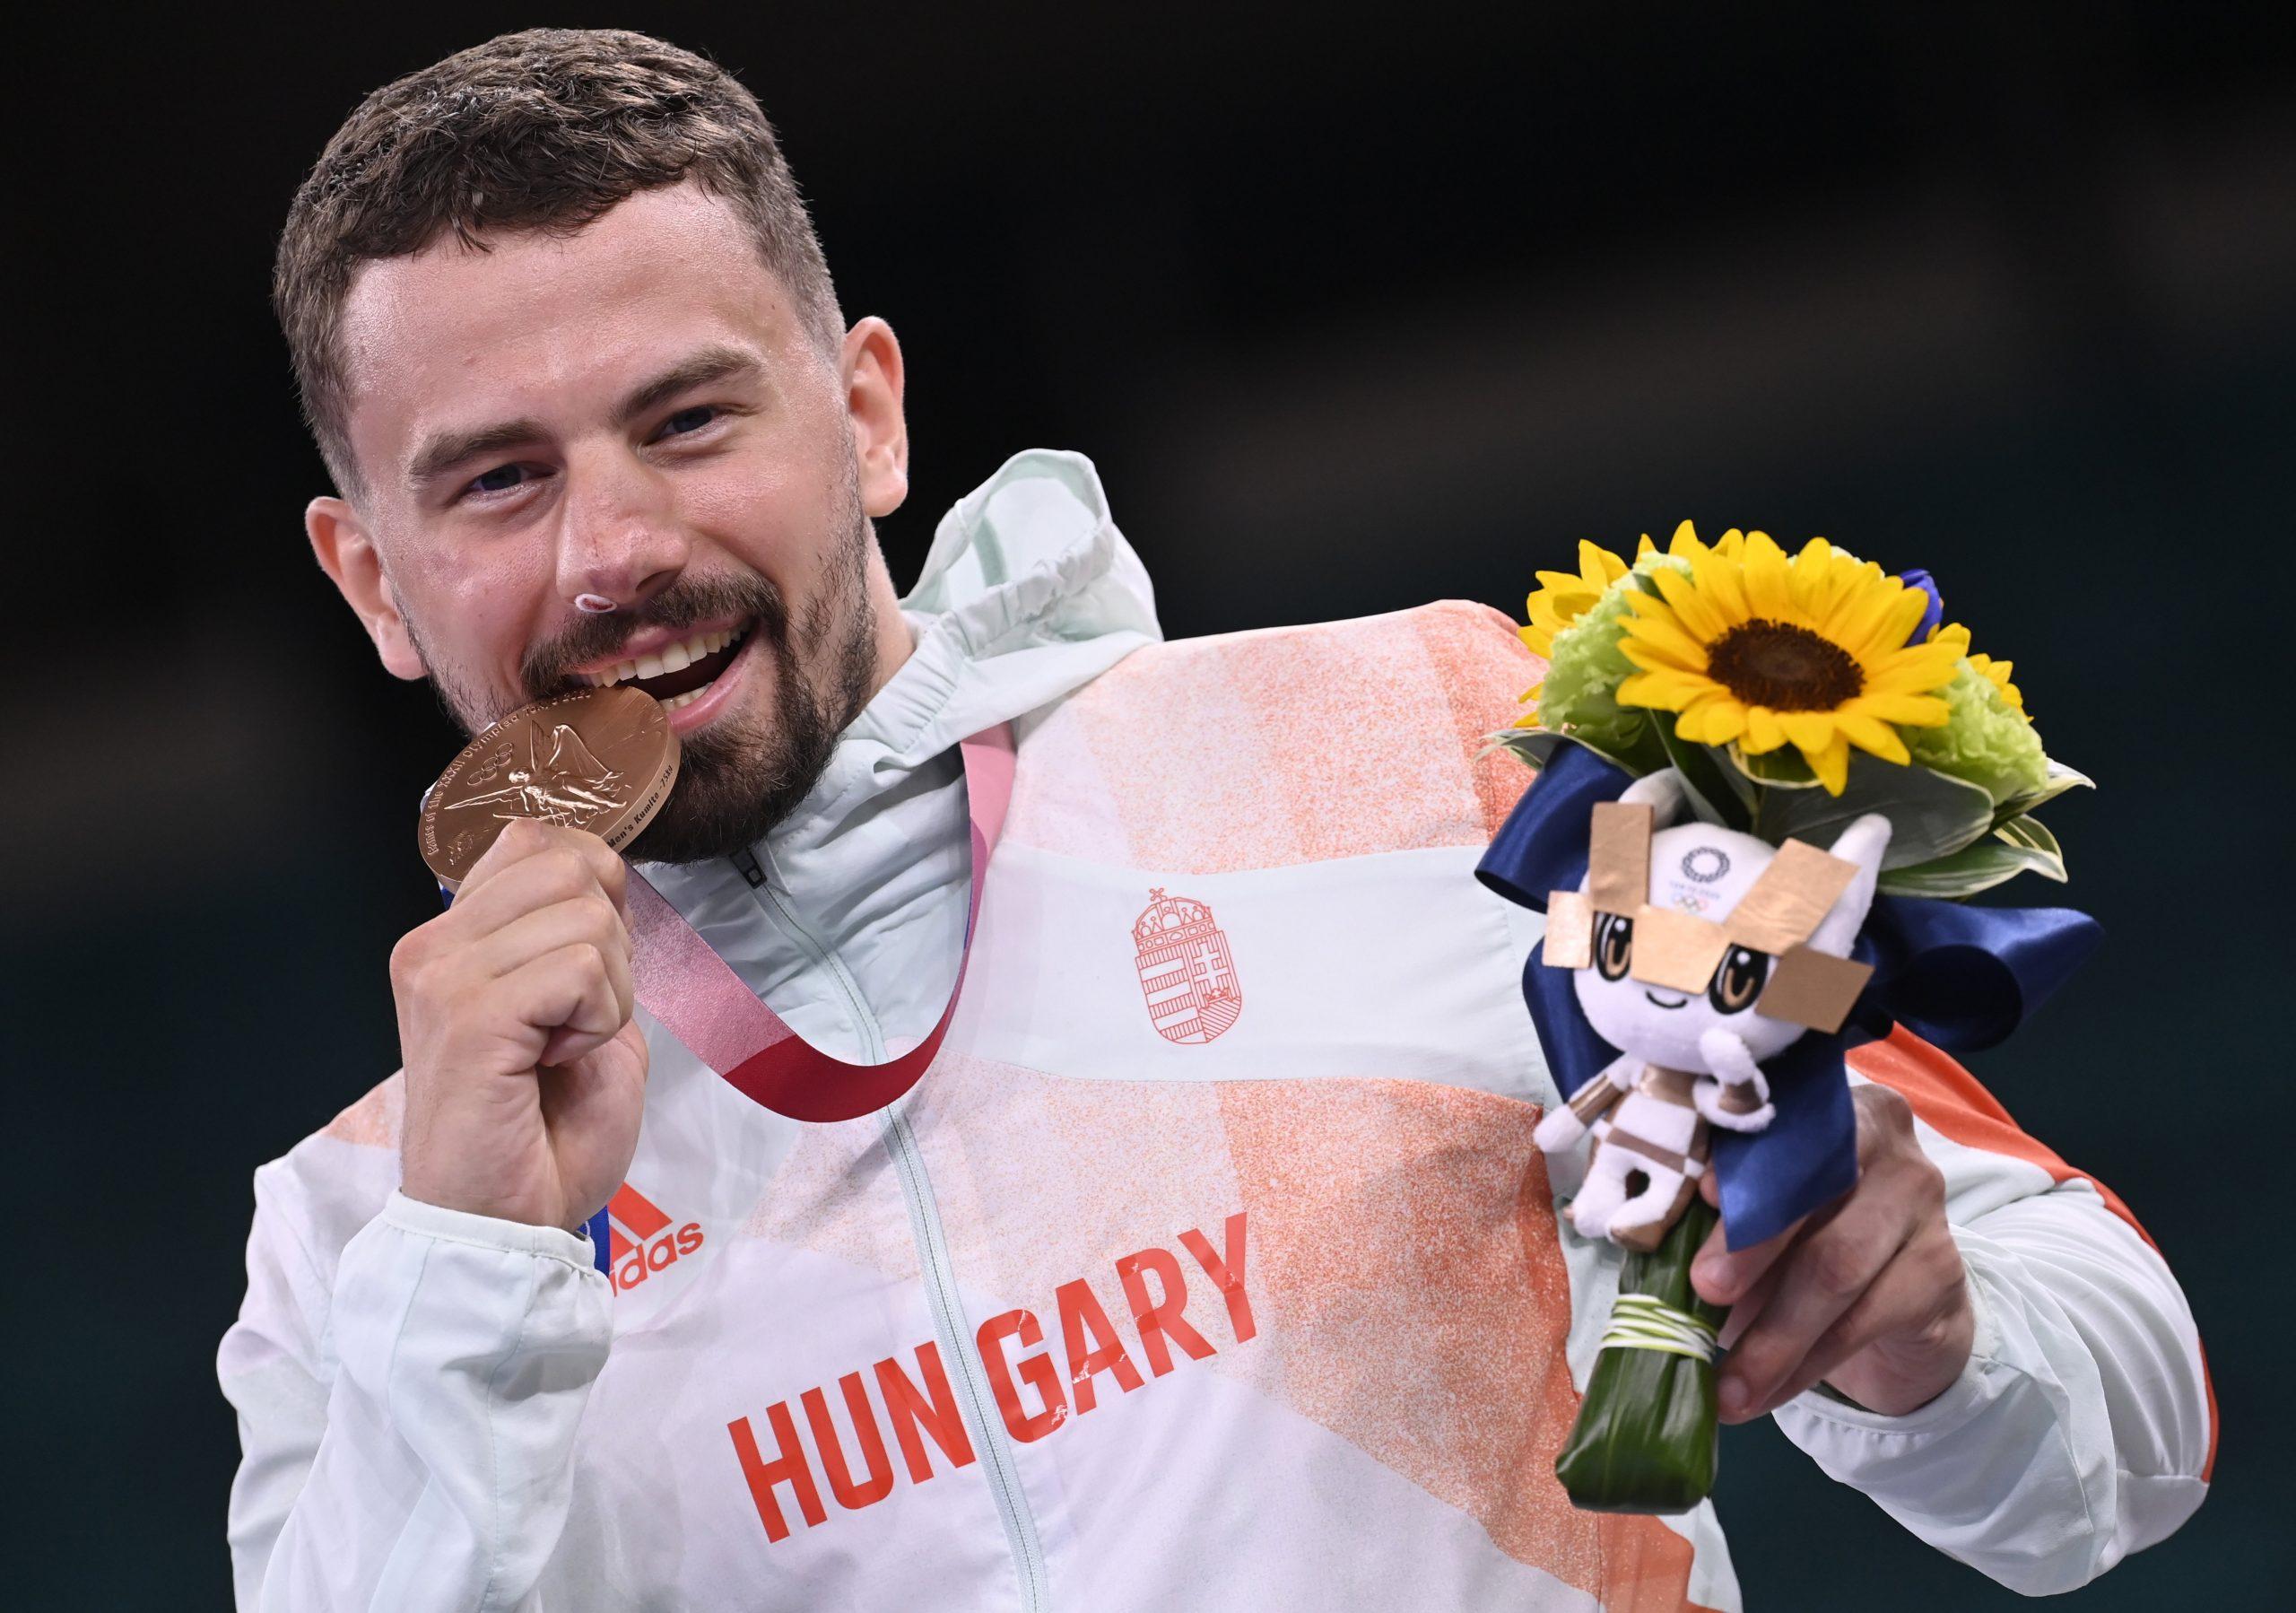 Hárspataki Claims Bronze in Men's 75kg Kumite